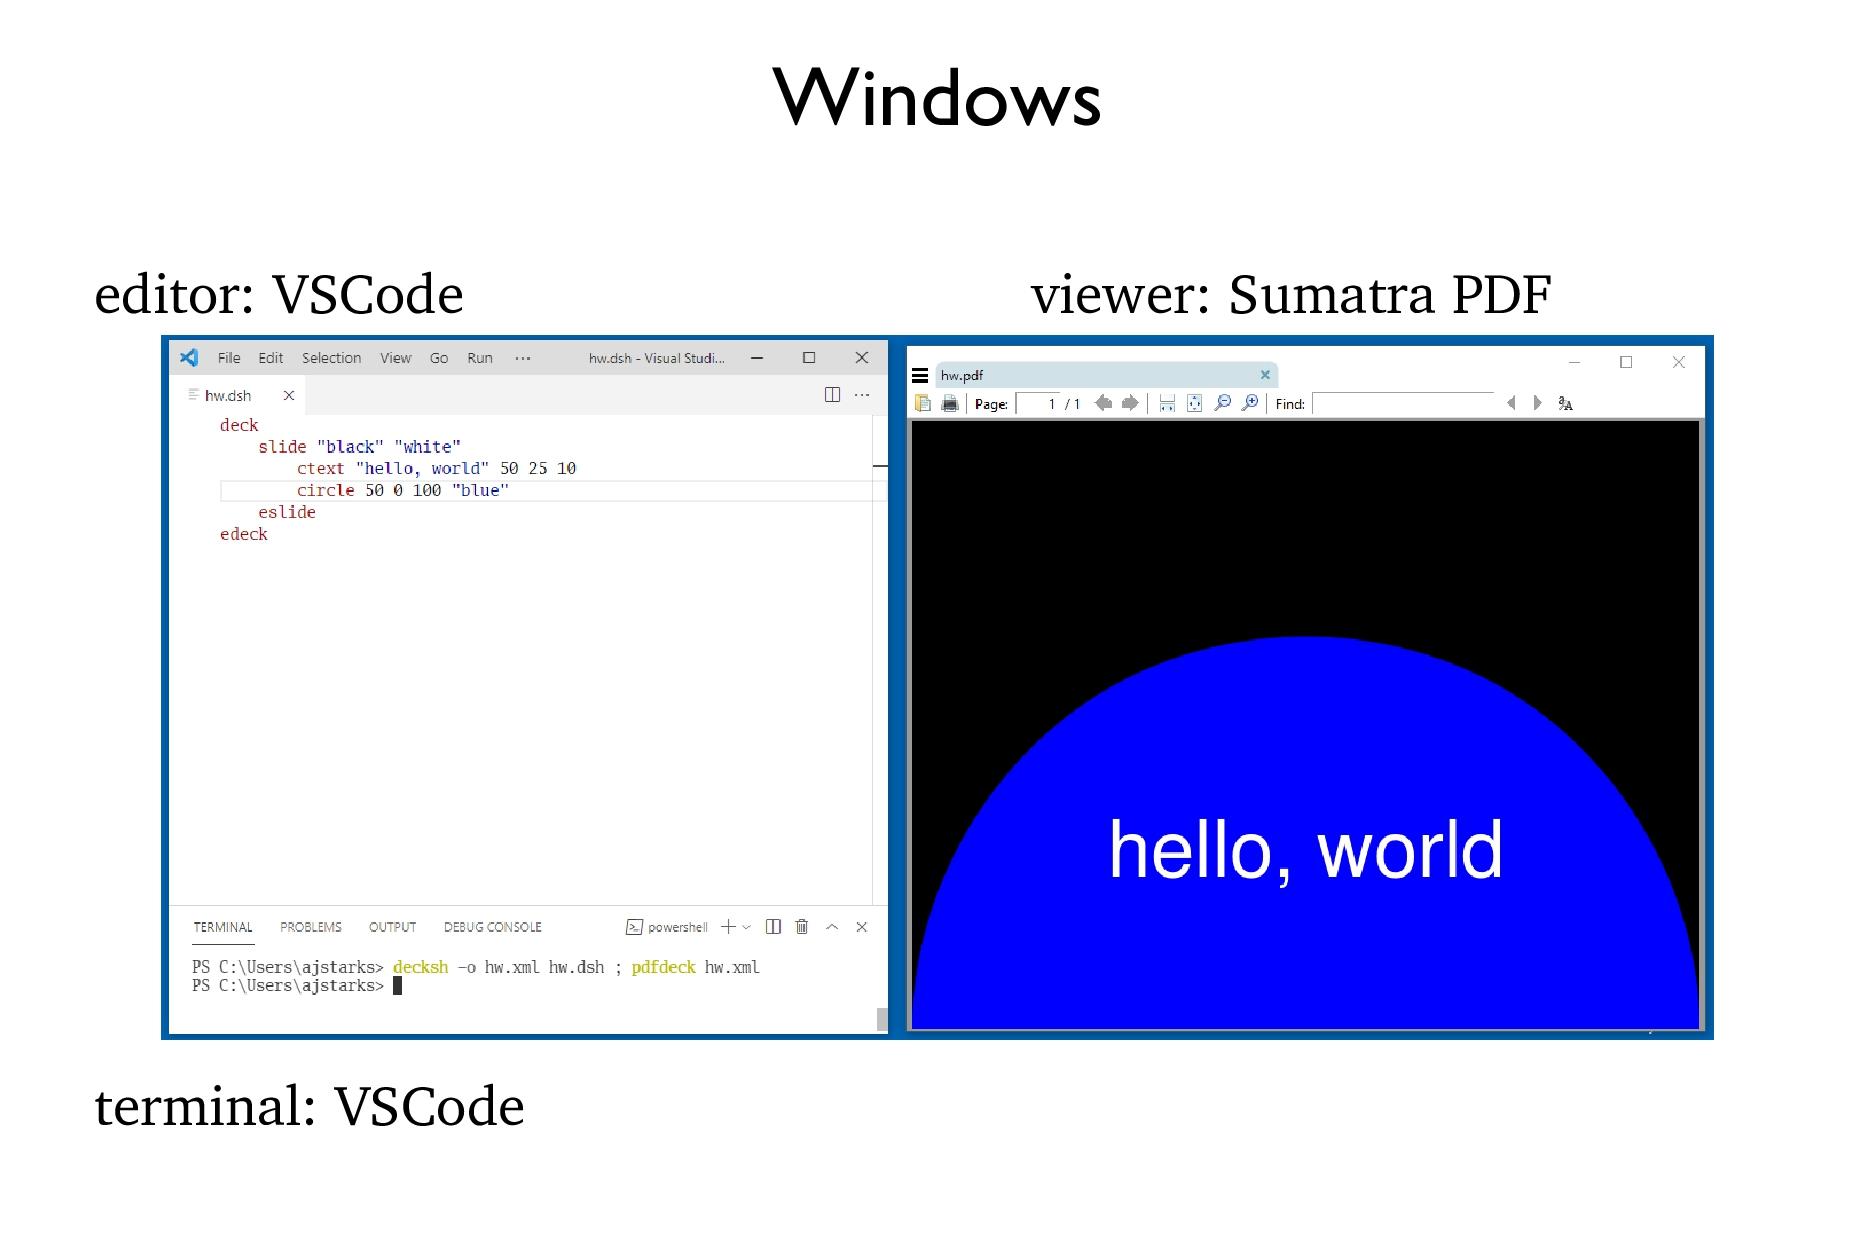 Windows editor: VSCode terminal: VSCode viewer:...